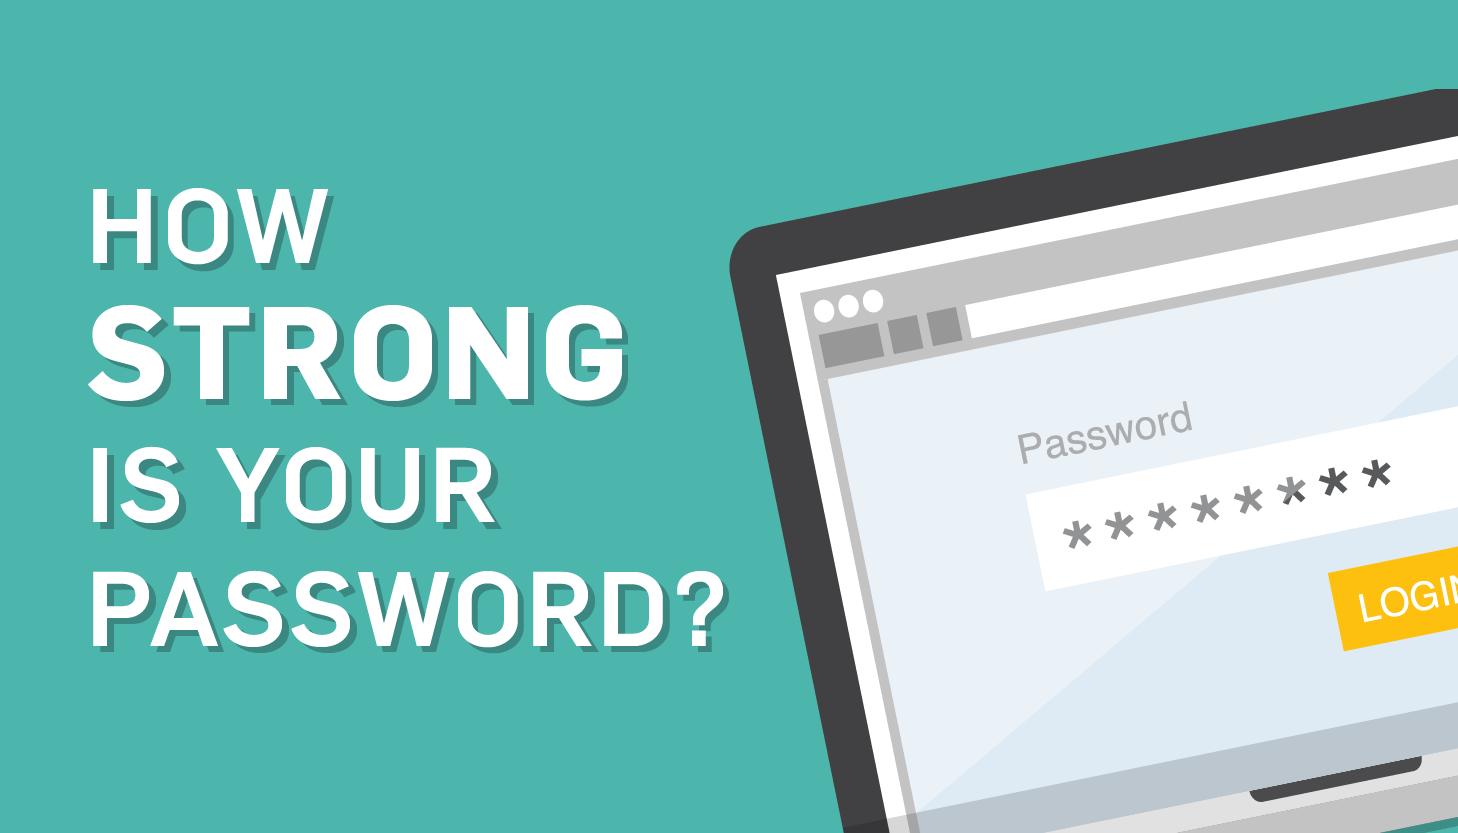 Begini Caranaya Membuat Password yang Aman tapi Mudah Diingat